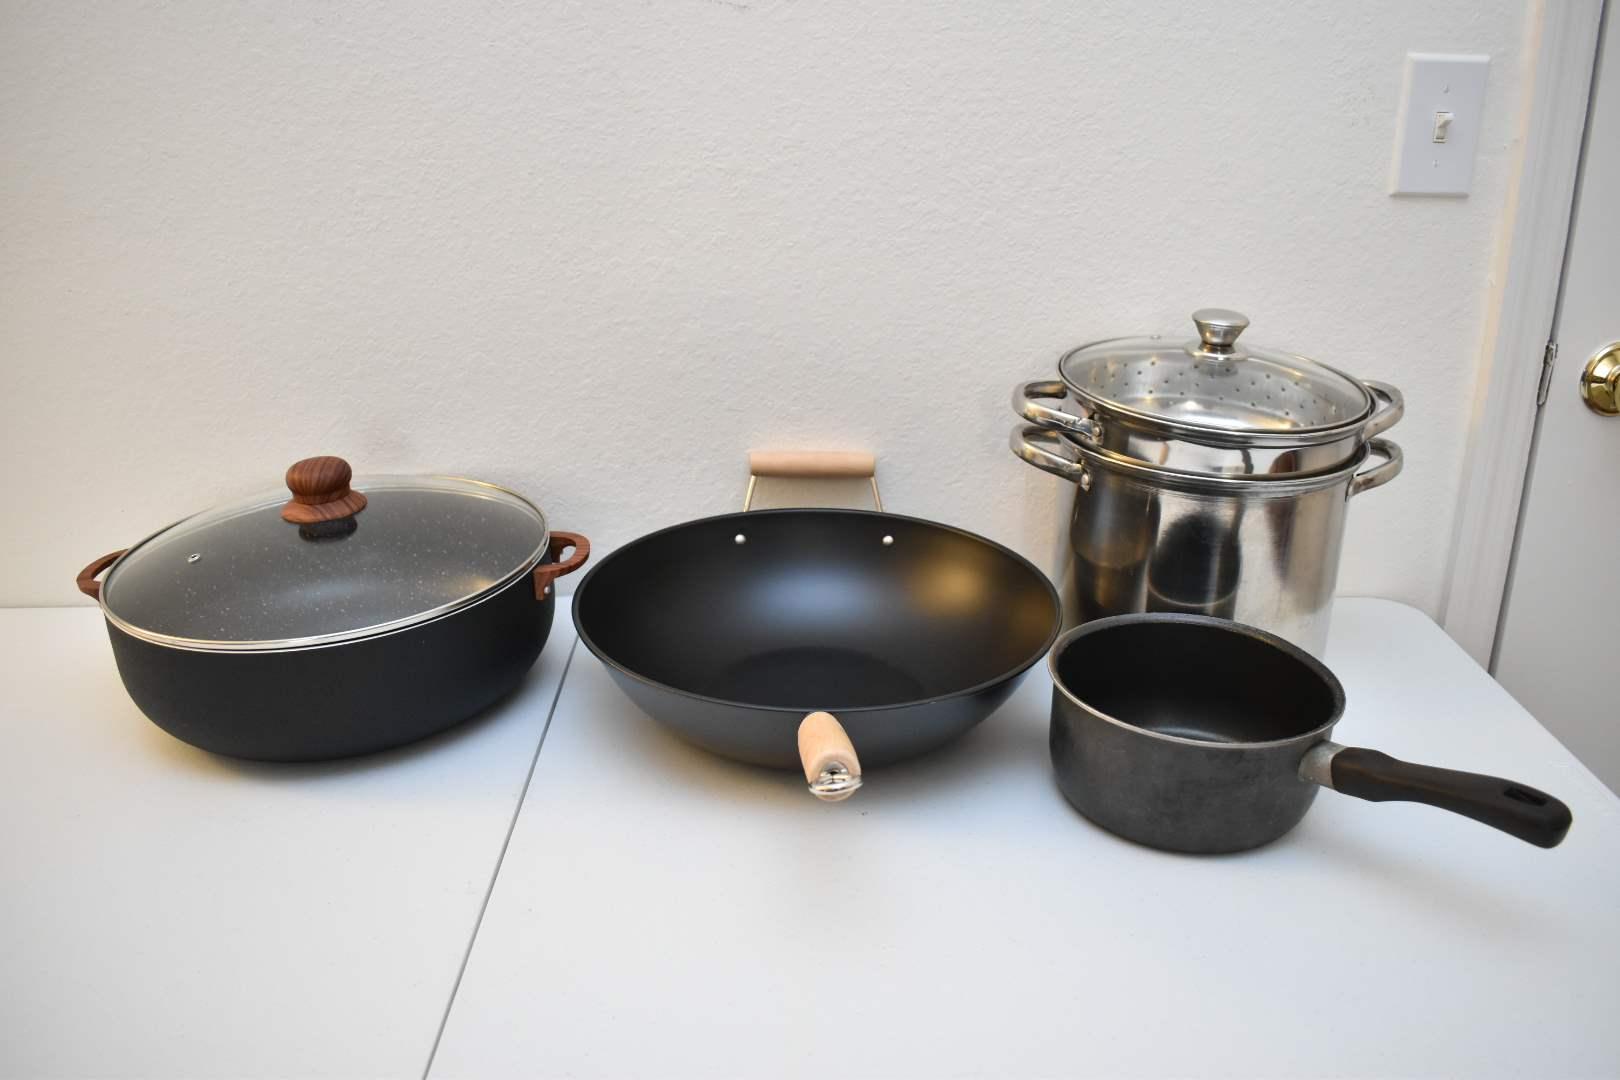 Wok, Steamer, Pots, etc